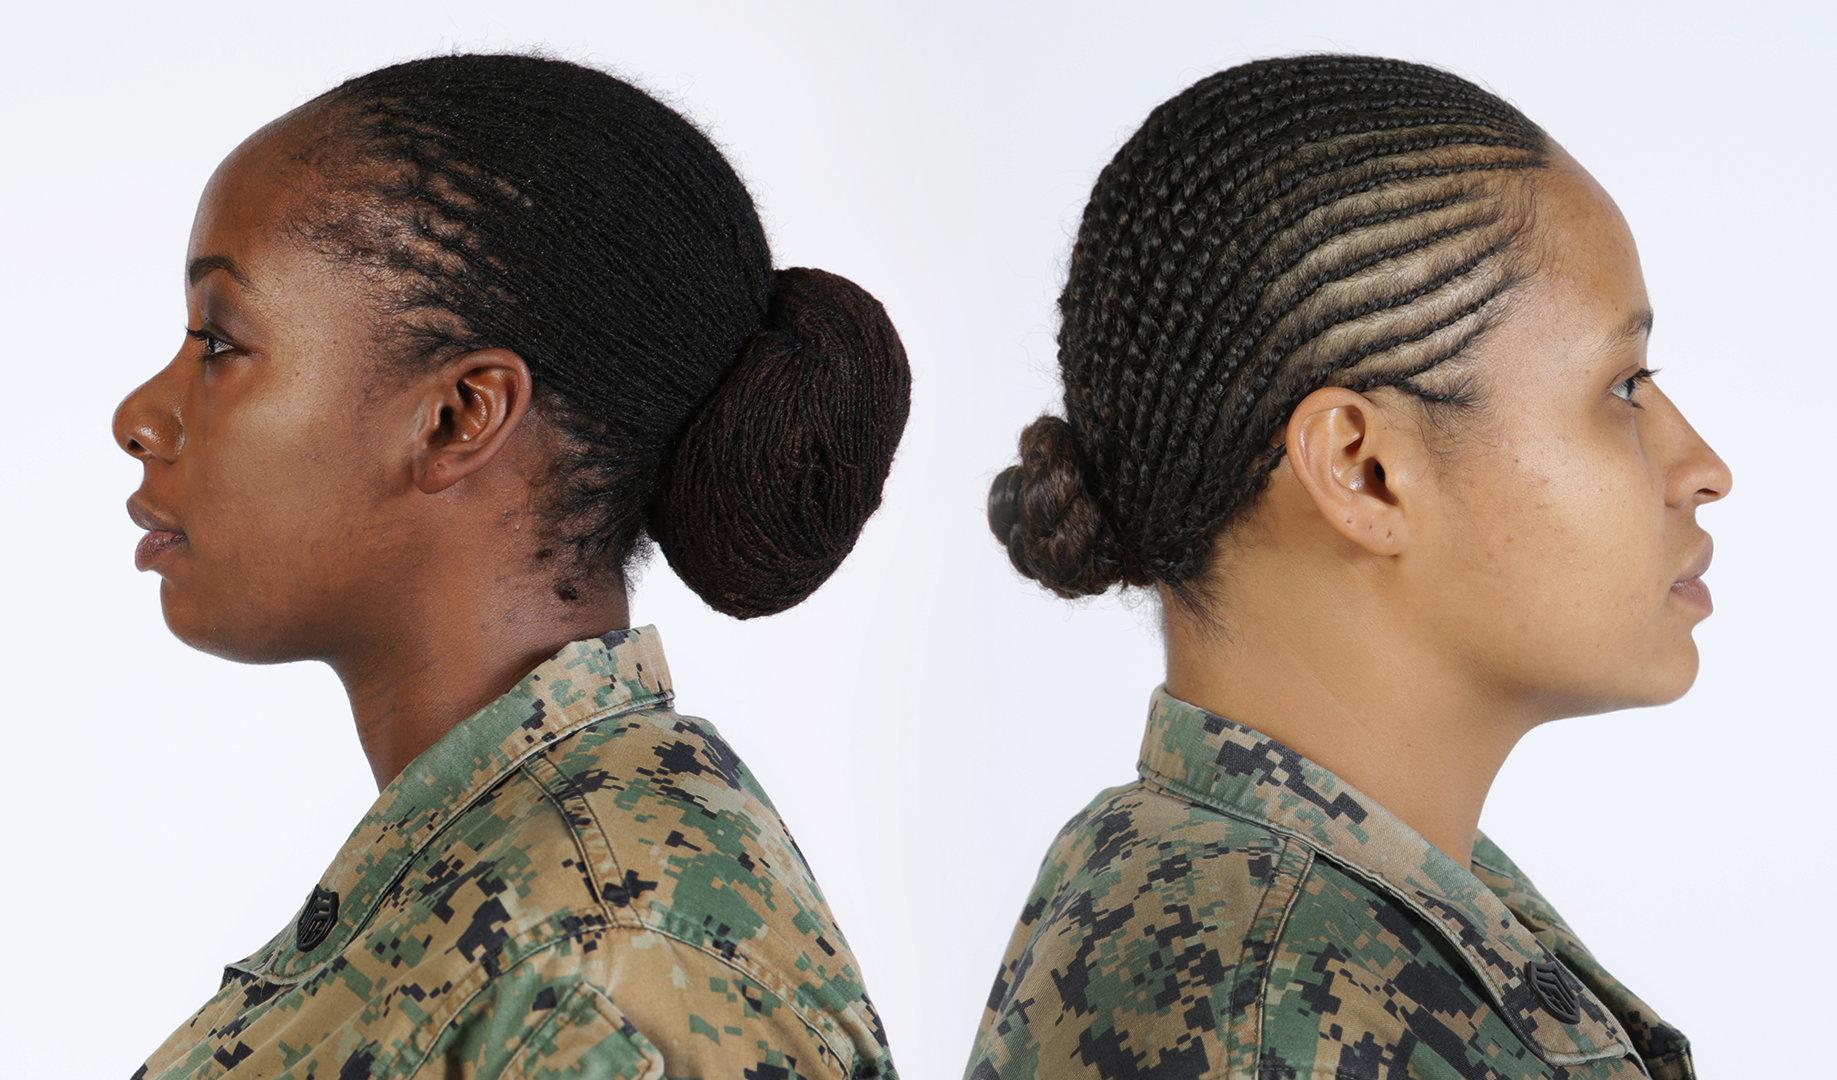 Army Lifts Ban On Dreadlocks And Black Servicewomen Rejoice The